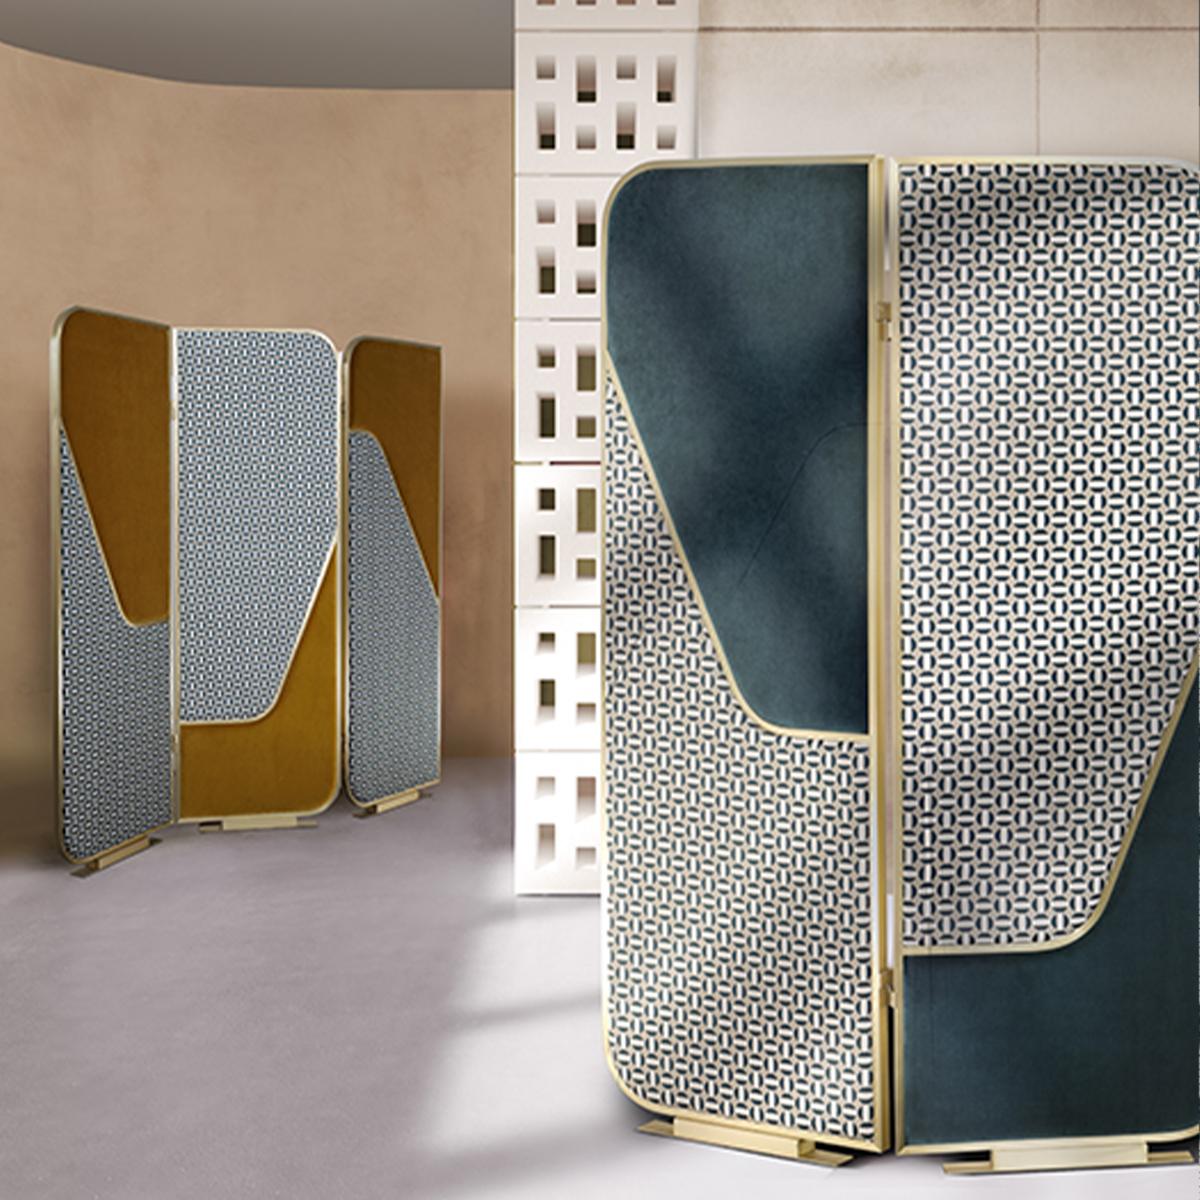 Pantallas Lujuosas: Ideas exclusivas para un proyecto moderno pantallas lujuosas Pantallas Lujuosas: Ideas exclusivas para un proyecto moderno essentialhome giulietta screen 1